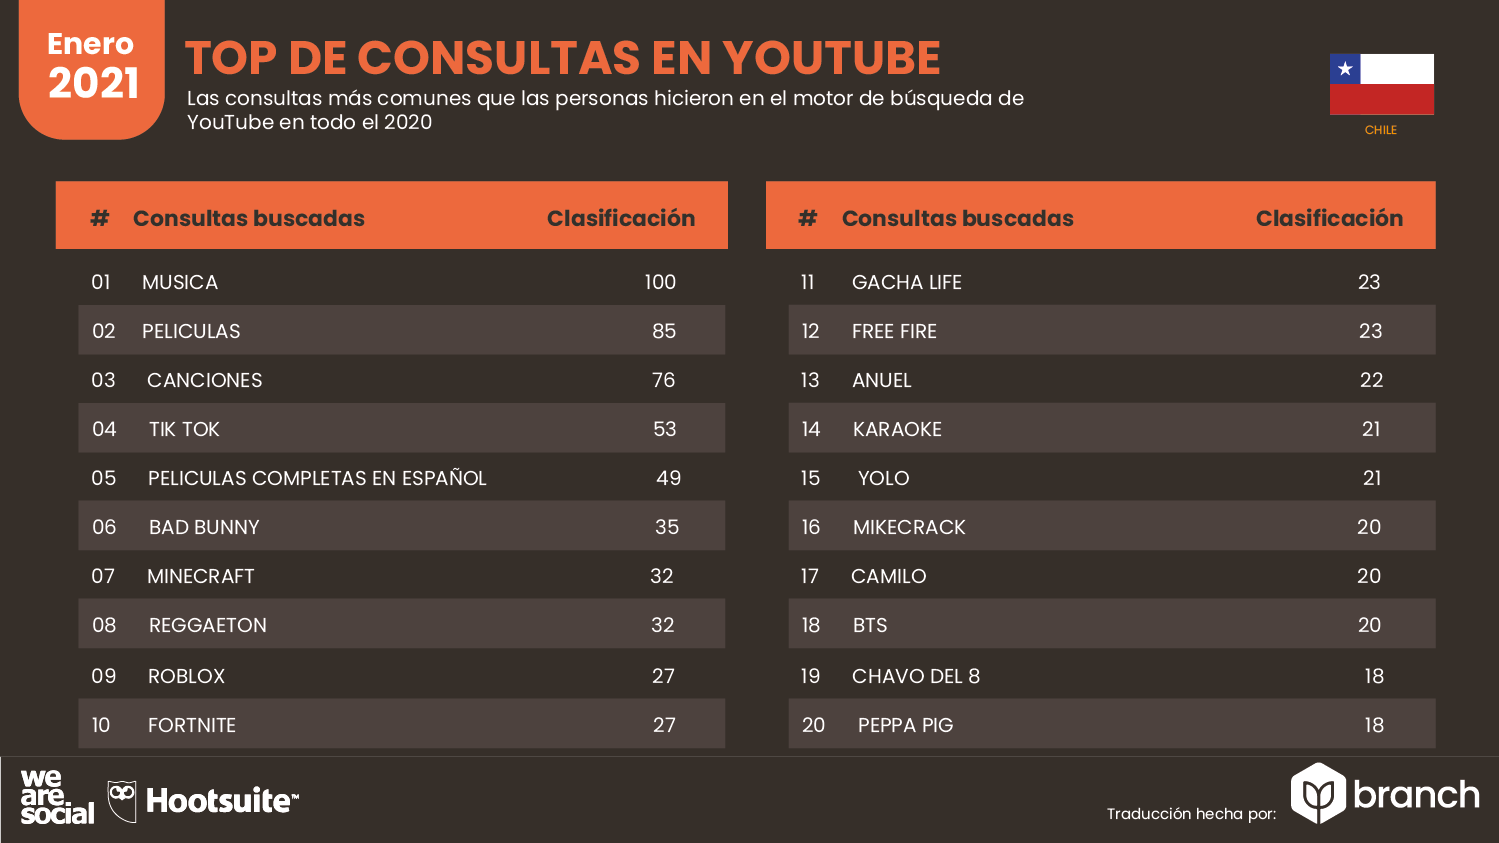 top-de-consultas-en-youtube-chile-2020-2021